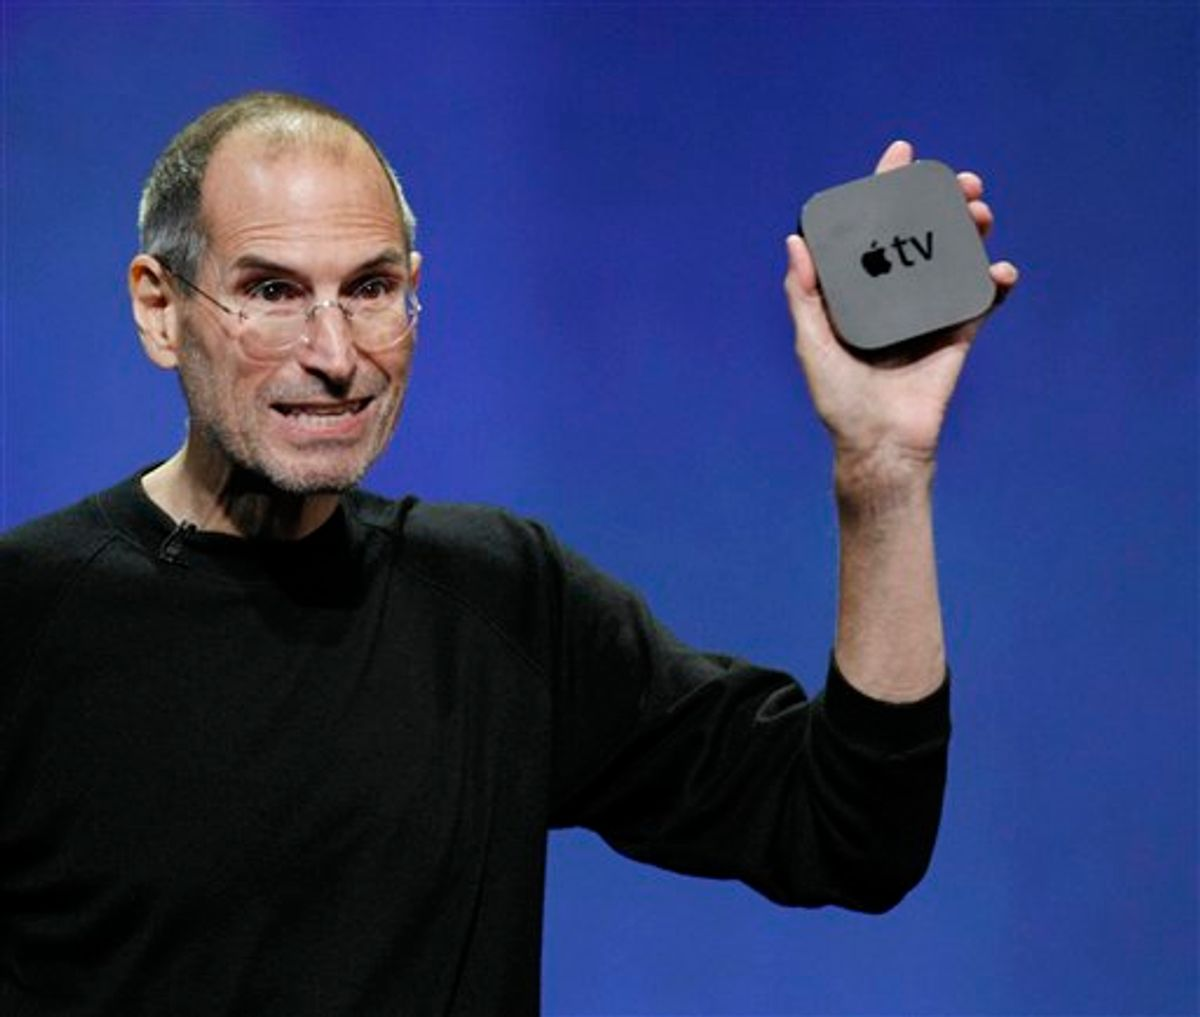 Apple CEO Steve Jobs displays the new AppleTV at news conference in San Francisco, Wednesday, Sept. 1, 2010. (AP Photo/Paul Sakuma)  (AP)